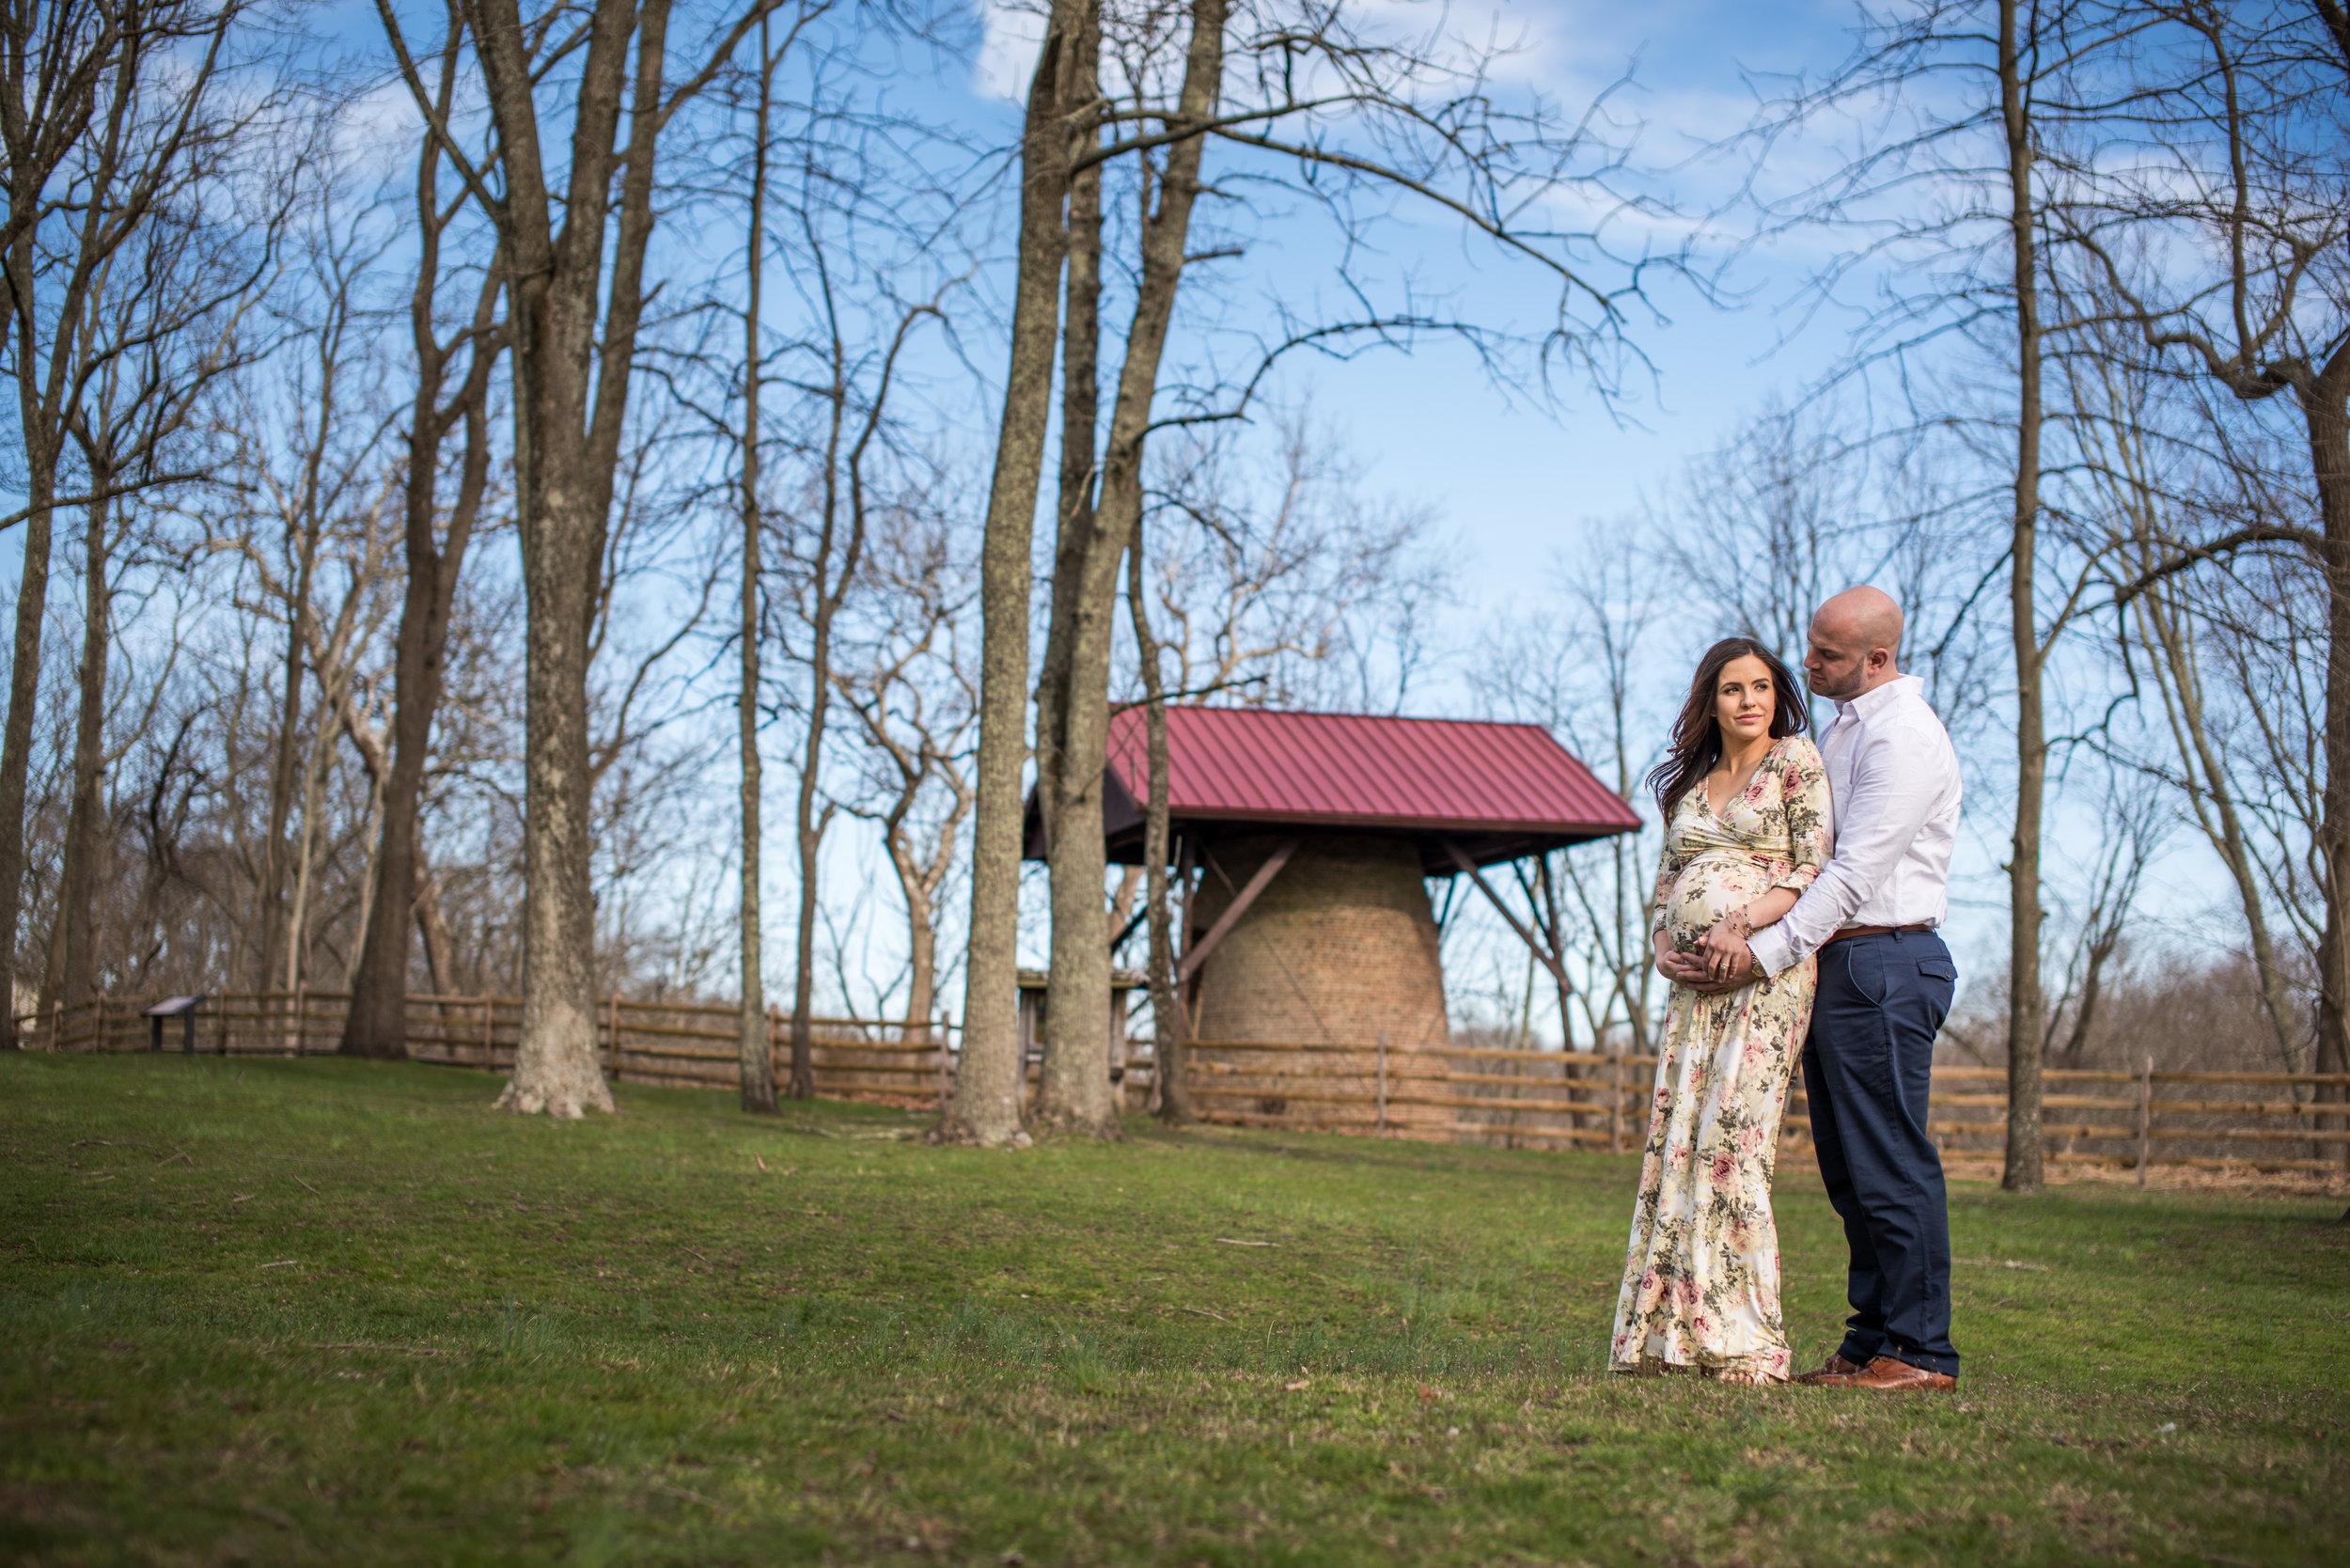 Allaire State Park Maternity Photo, Kristen 9